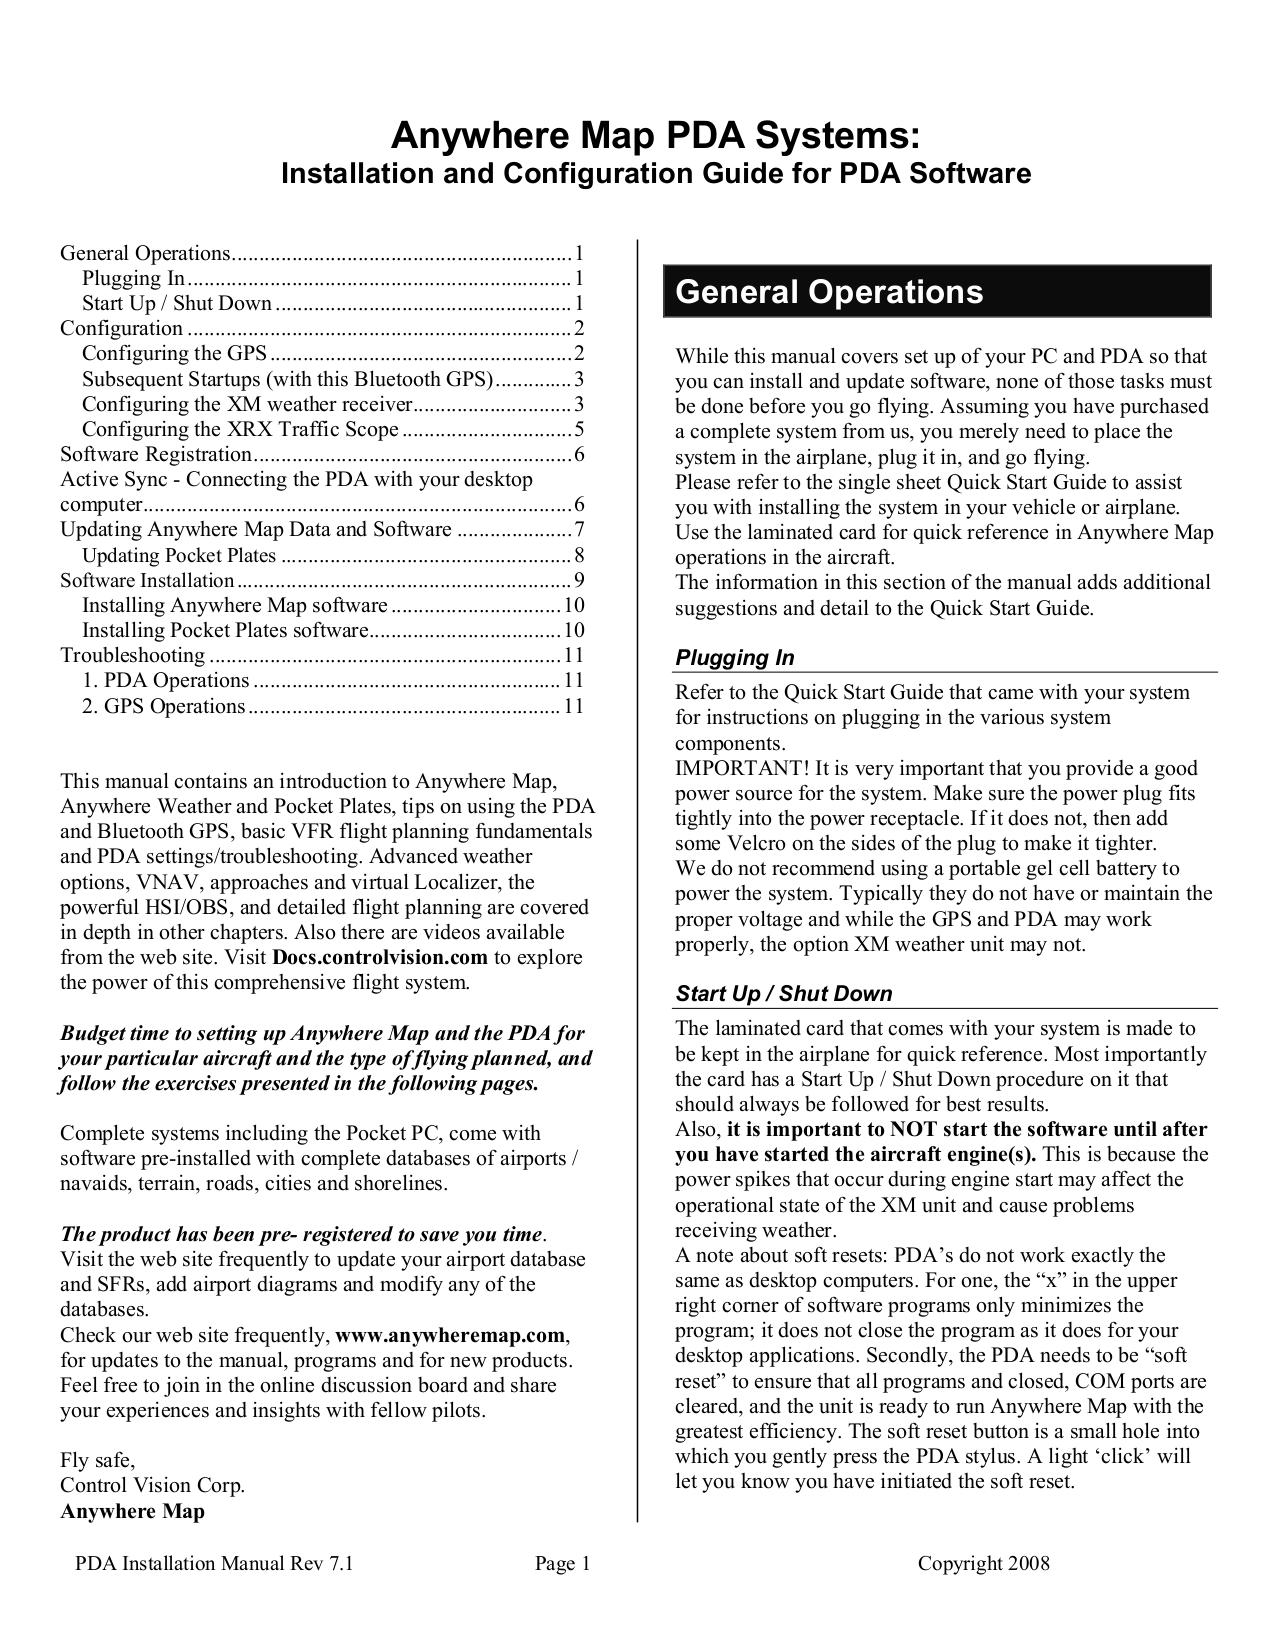 download free pdf for hp ipaq 210 pda manual rh umlib com hp ipaq 214 manual hp ipaq 210 manual pdf